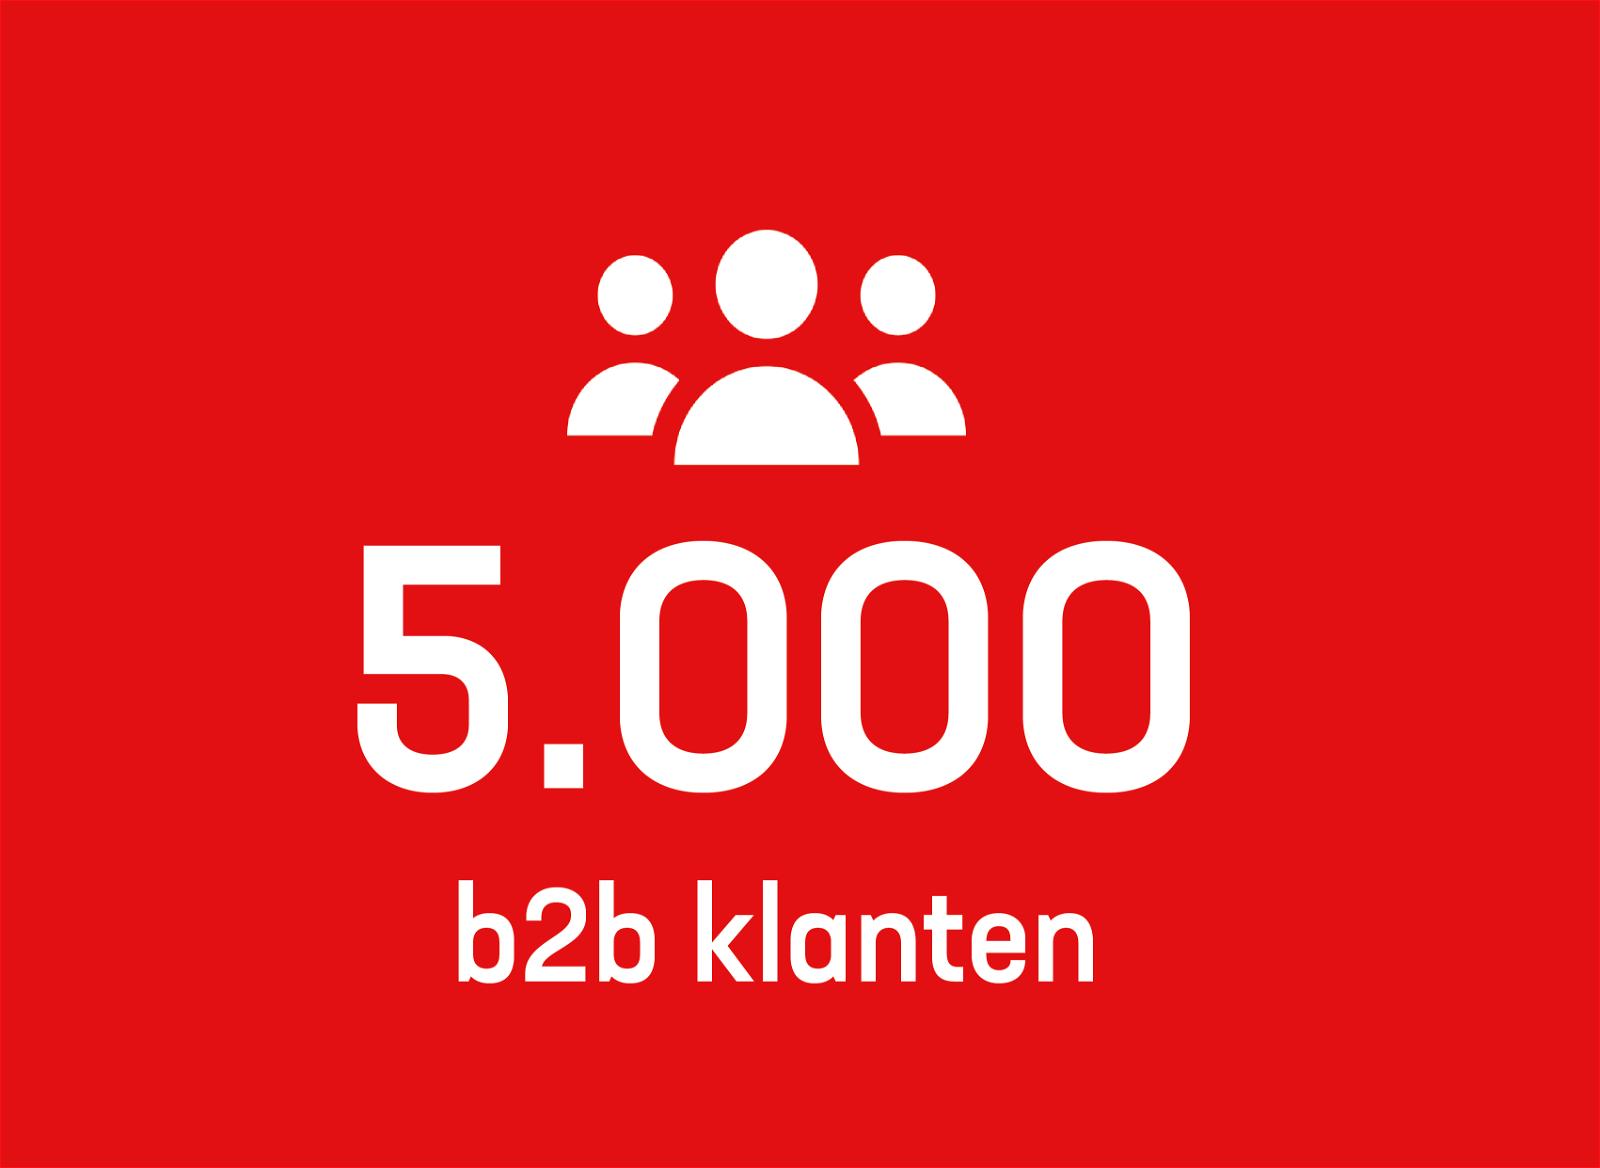 5000 b2b klanten